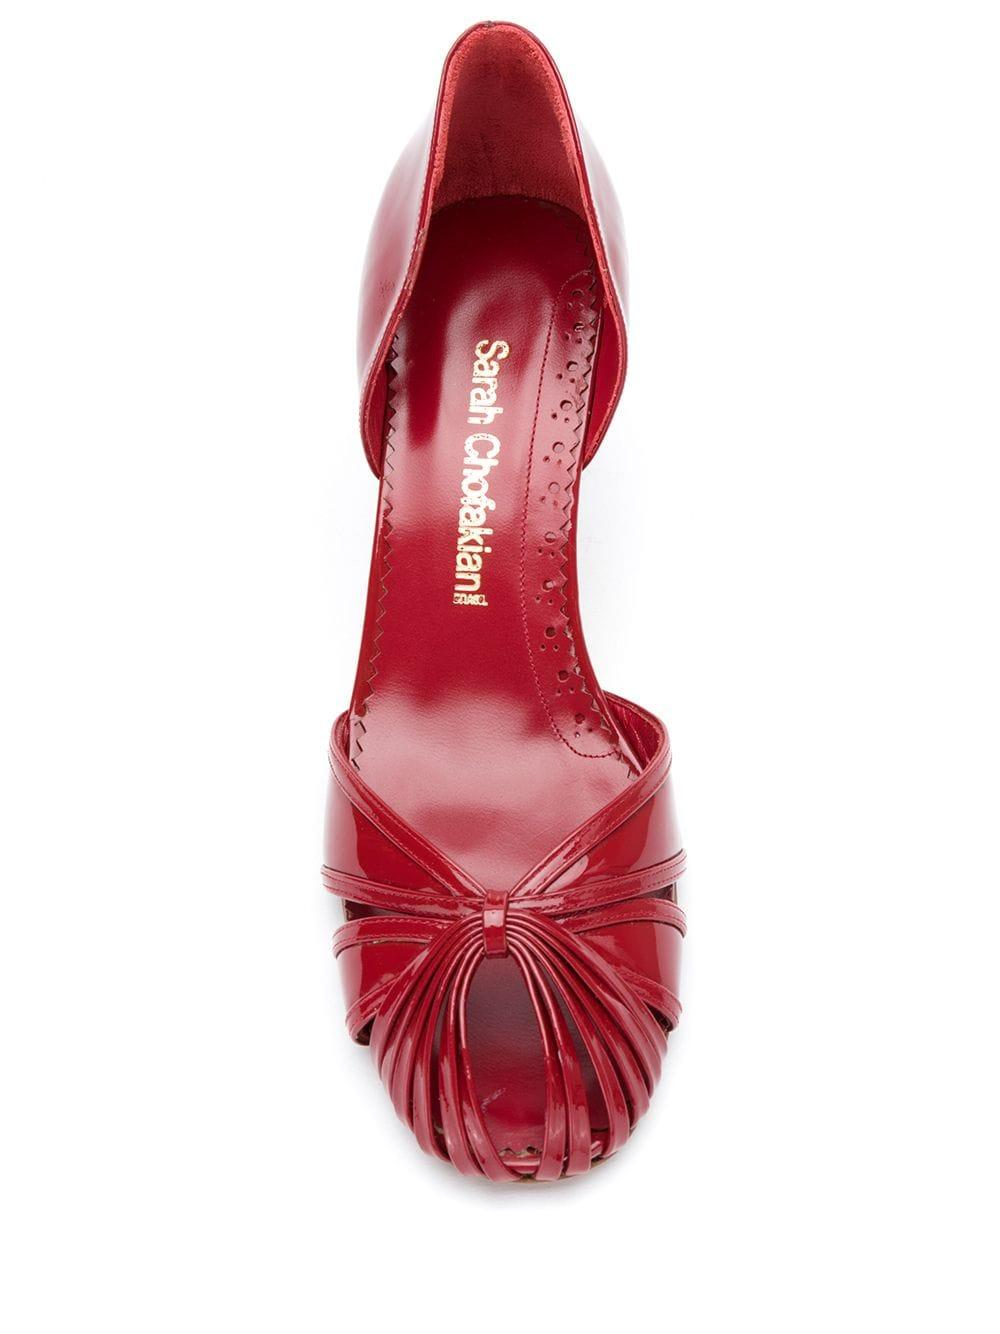 Zapatos de tacón Sarah Sarah Chofakian de Cuero de color Rojo